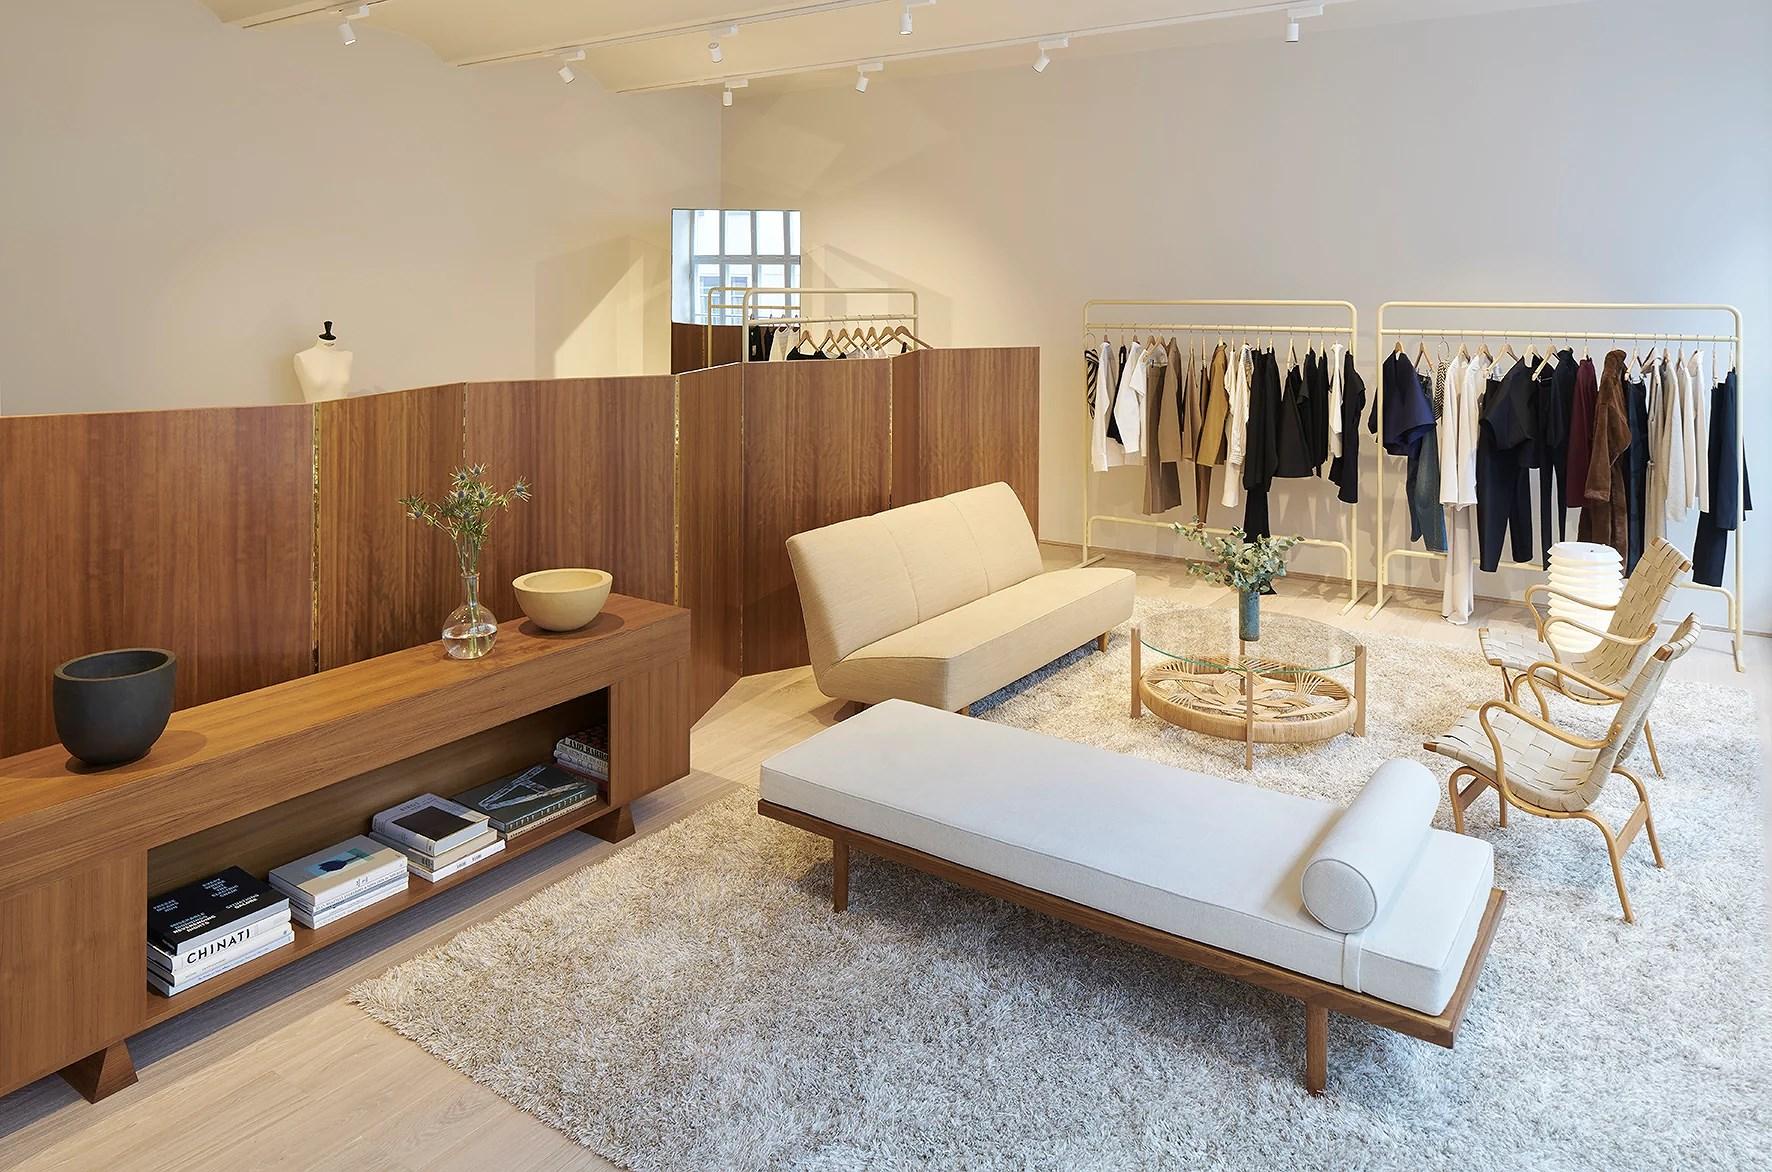 Totême's new showroom